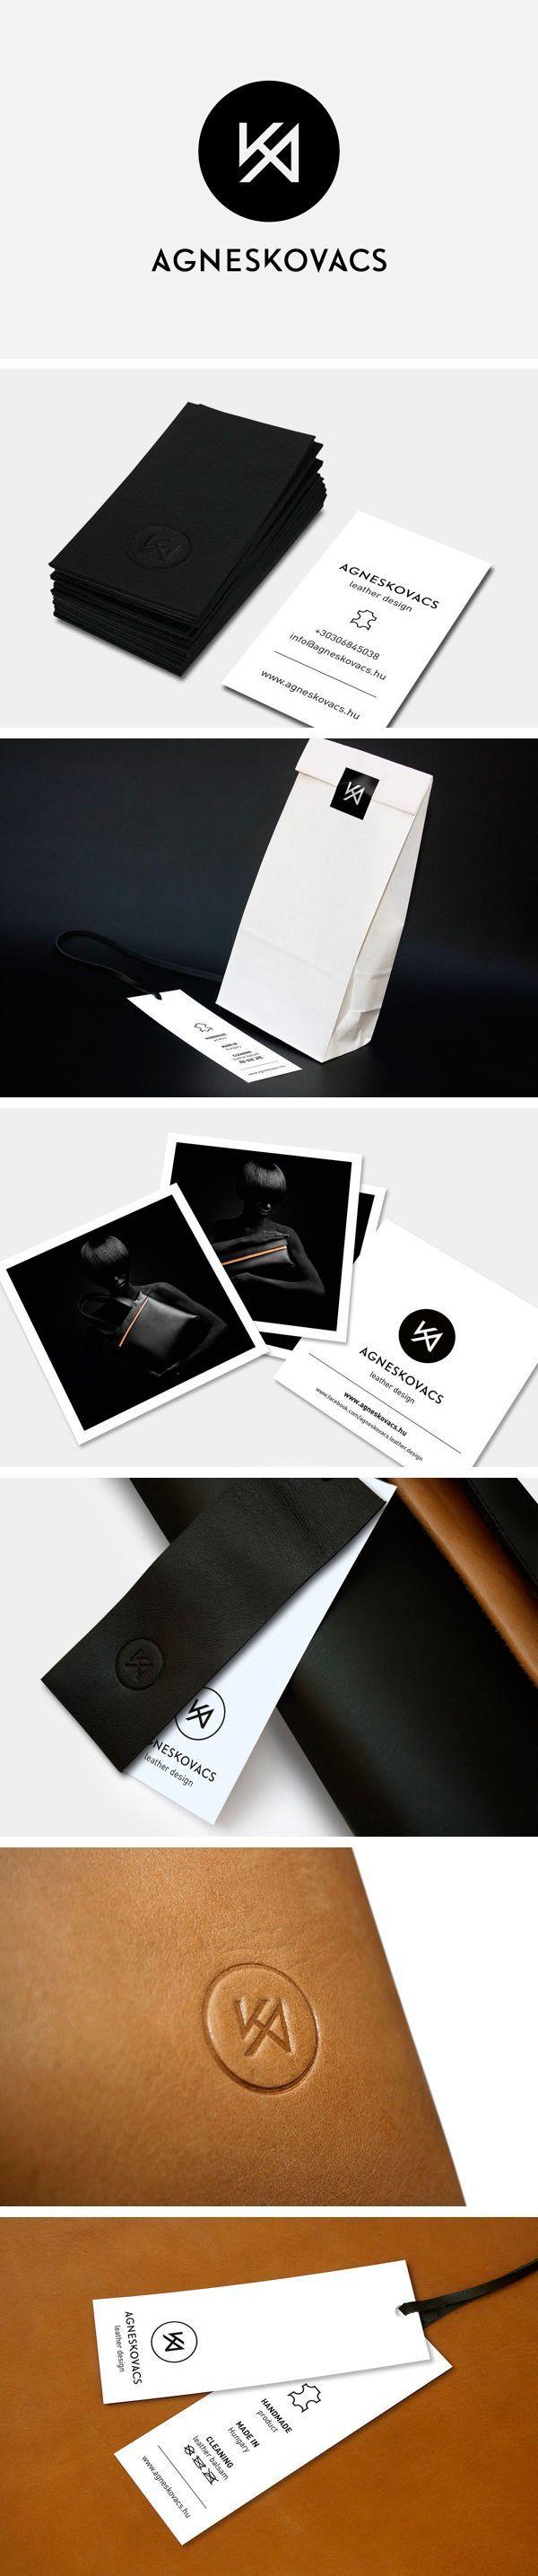 AgnesKovacs #Logo #Corporate #Identity #Stationery #Graphic #Design